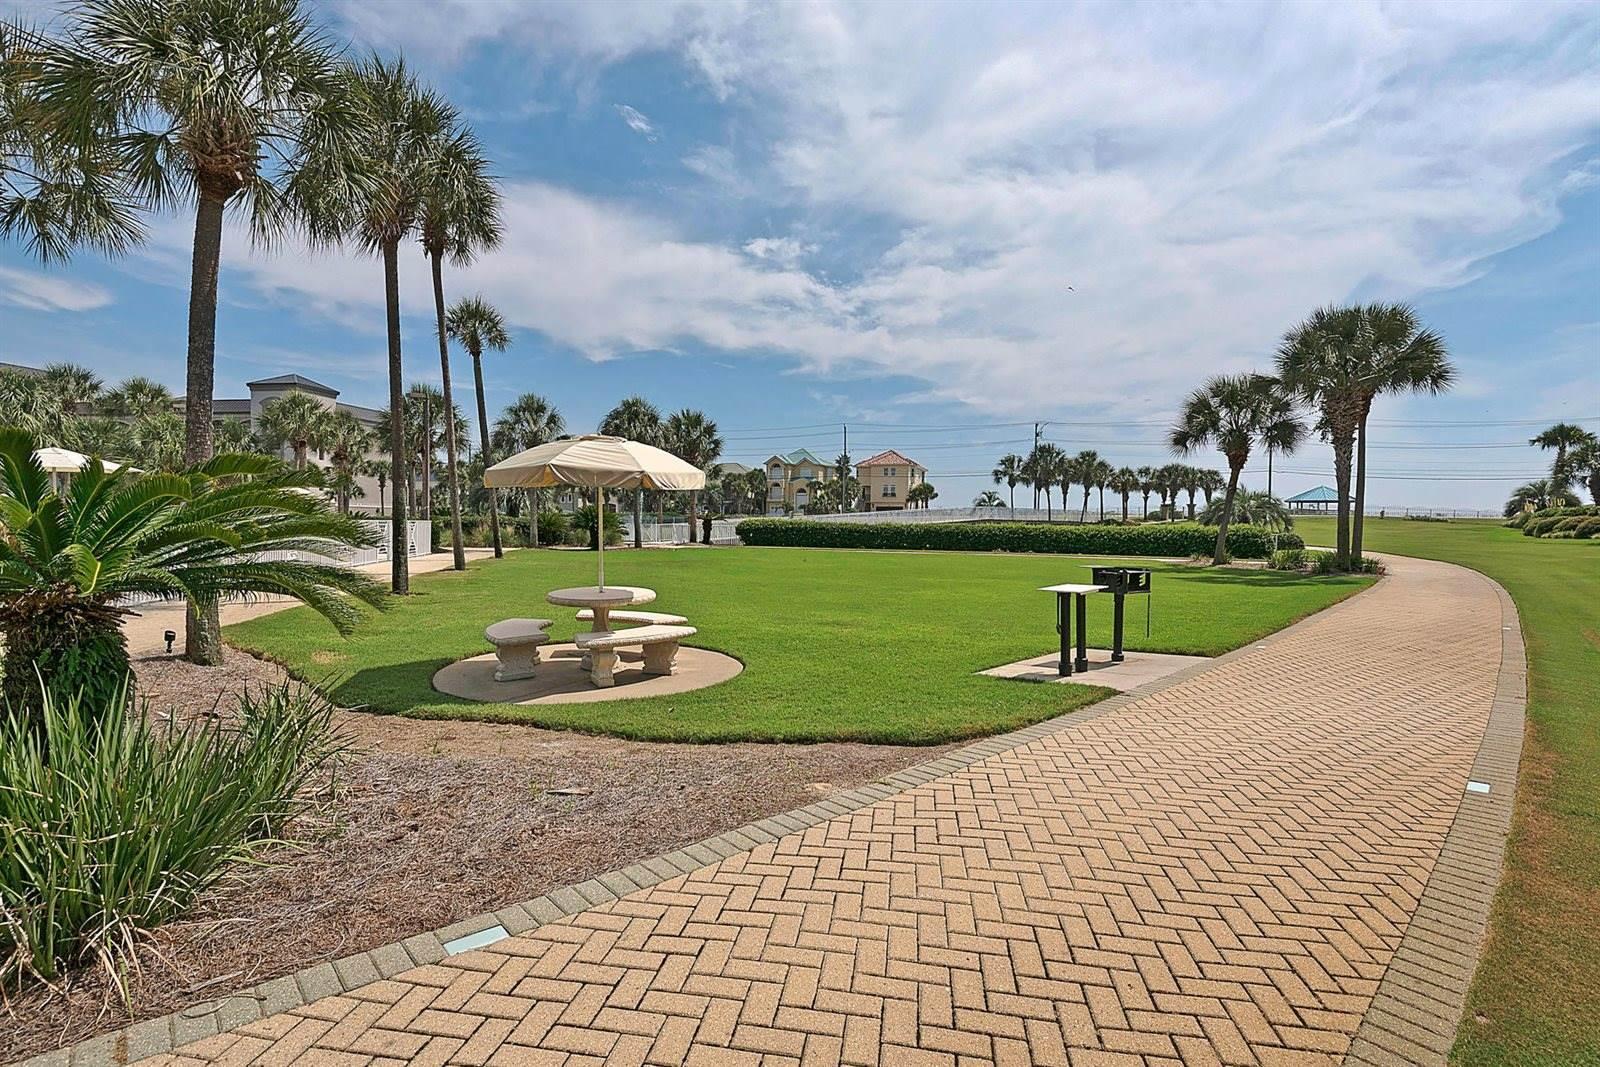 778 Scenic Gulf Drive, Unit D324, Miramar Beach, FL 32550